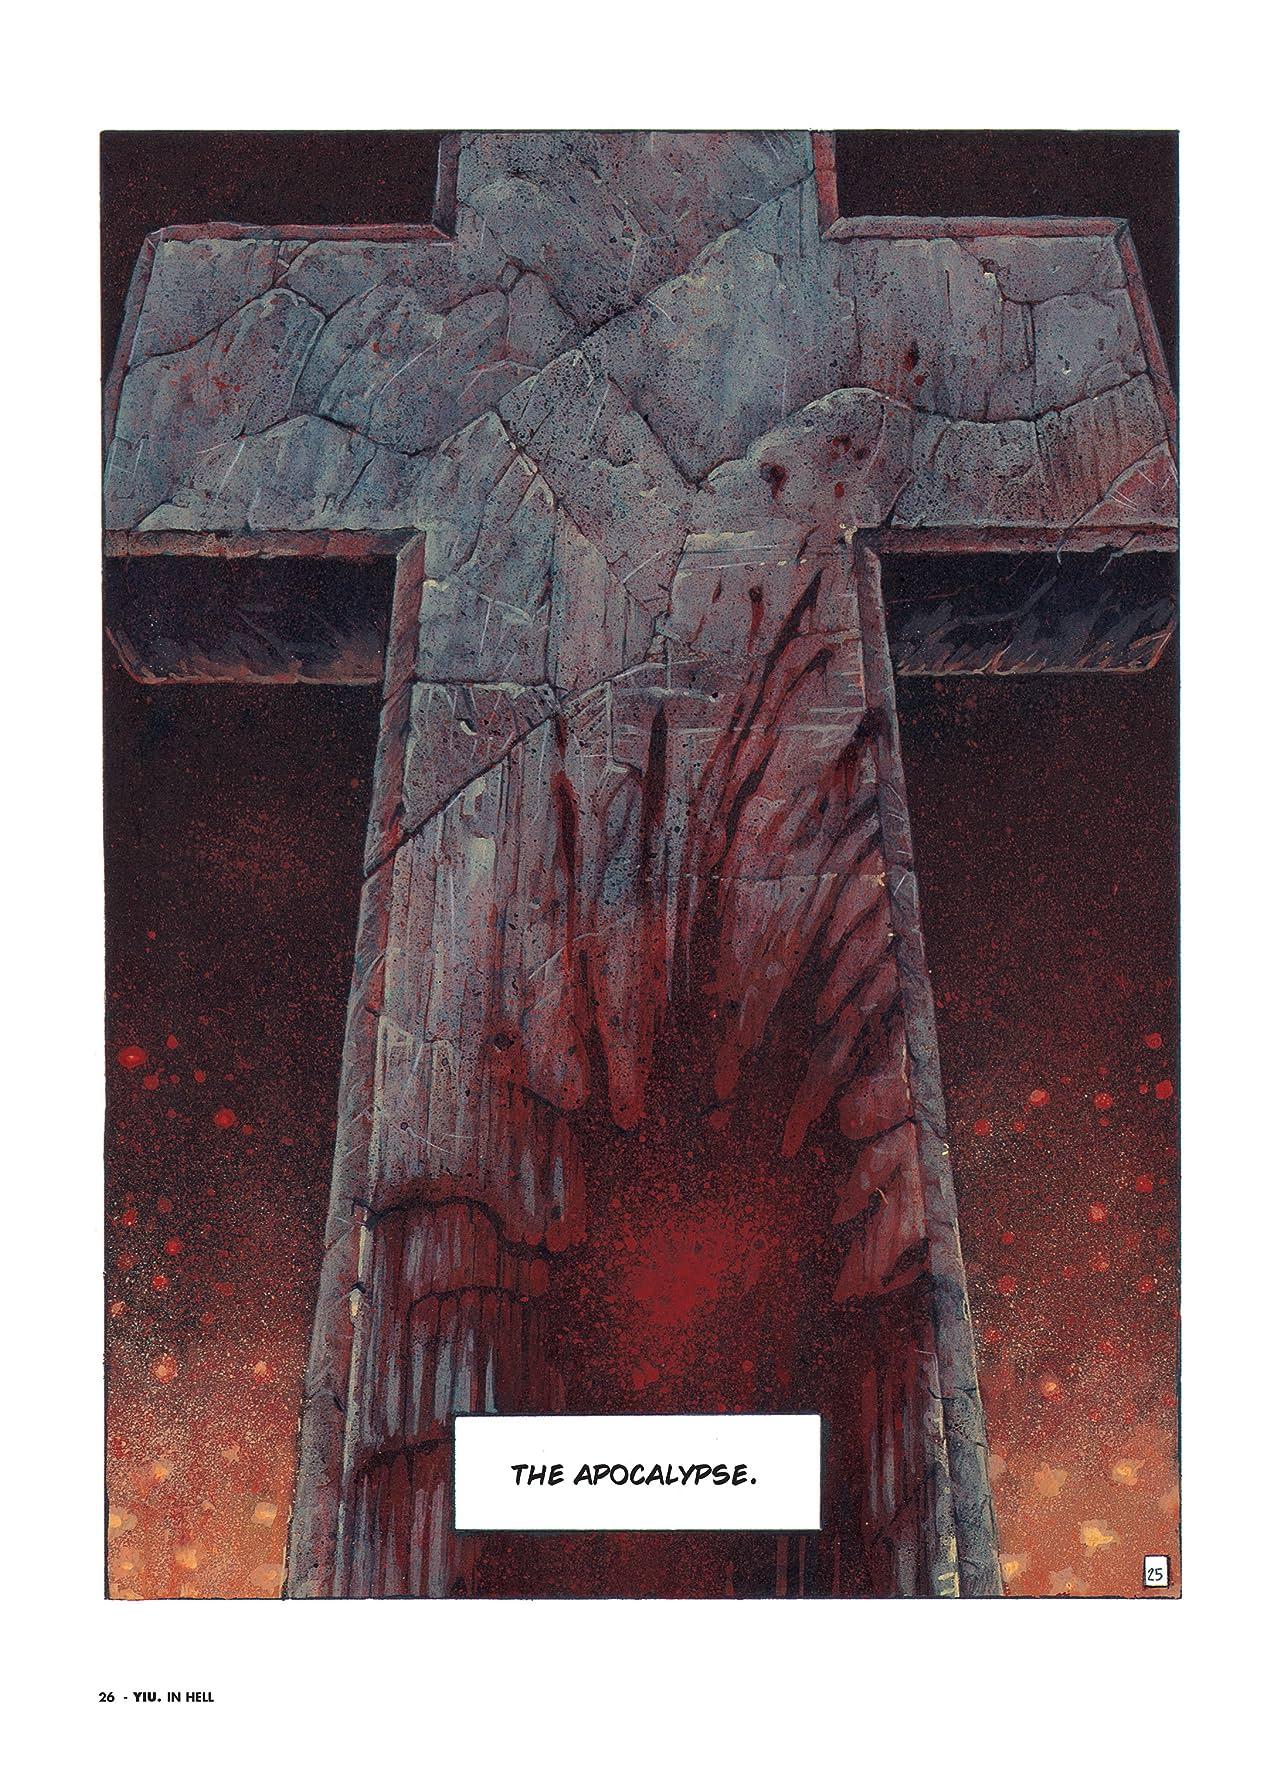 Yiu Vol. 1: In Hell